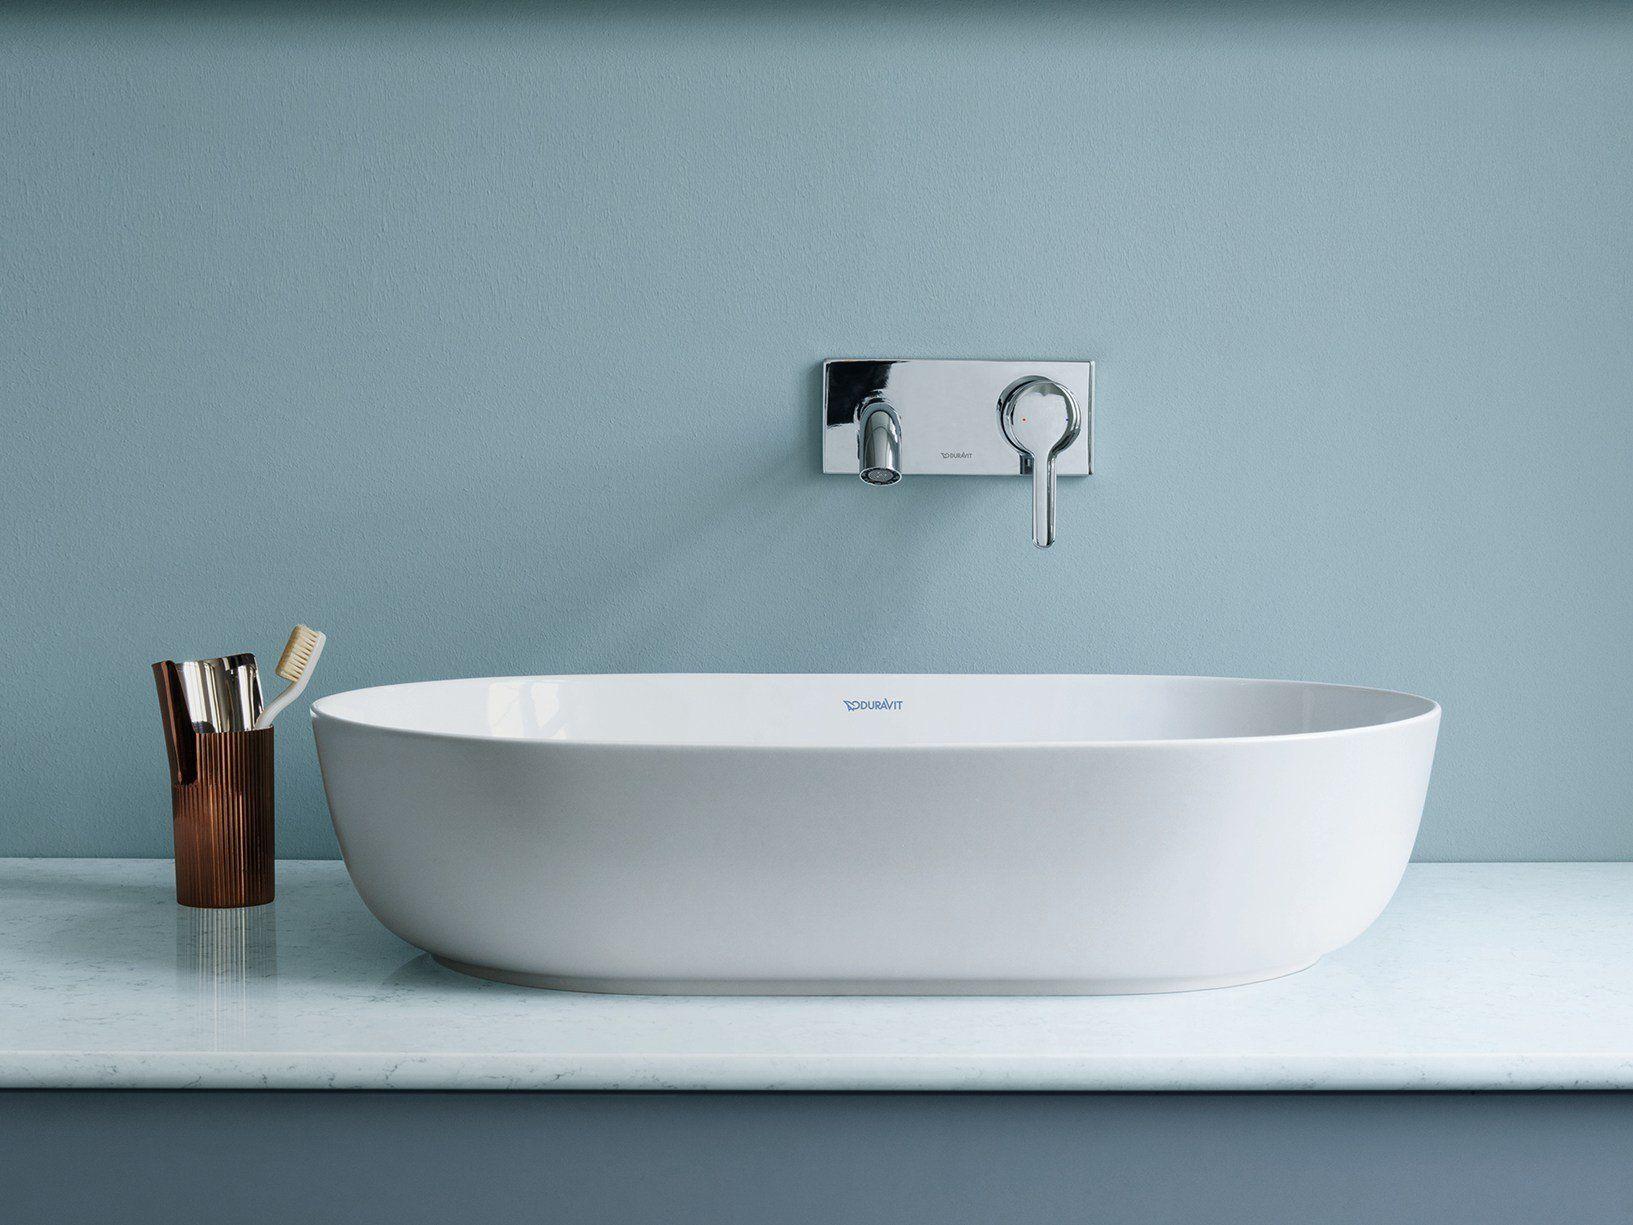 Vasca Da Bagno Larga 60 Cm : Duravit minimo ingombro e massima resa in bagno